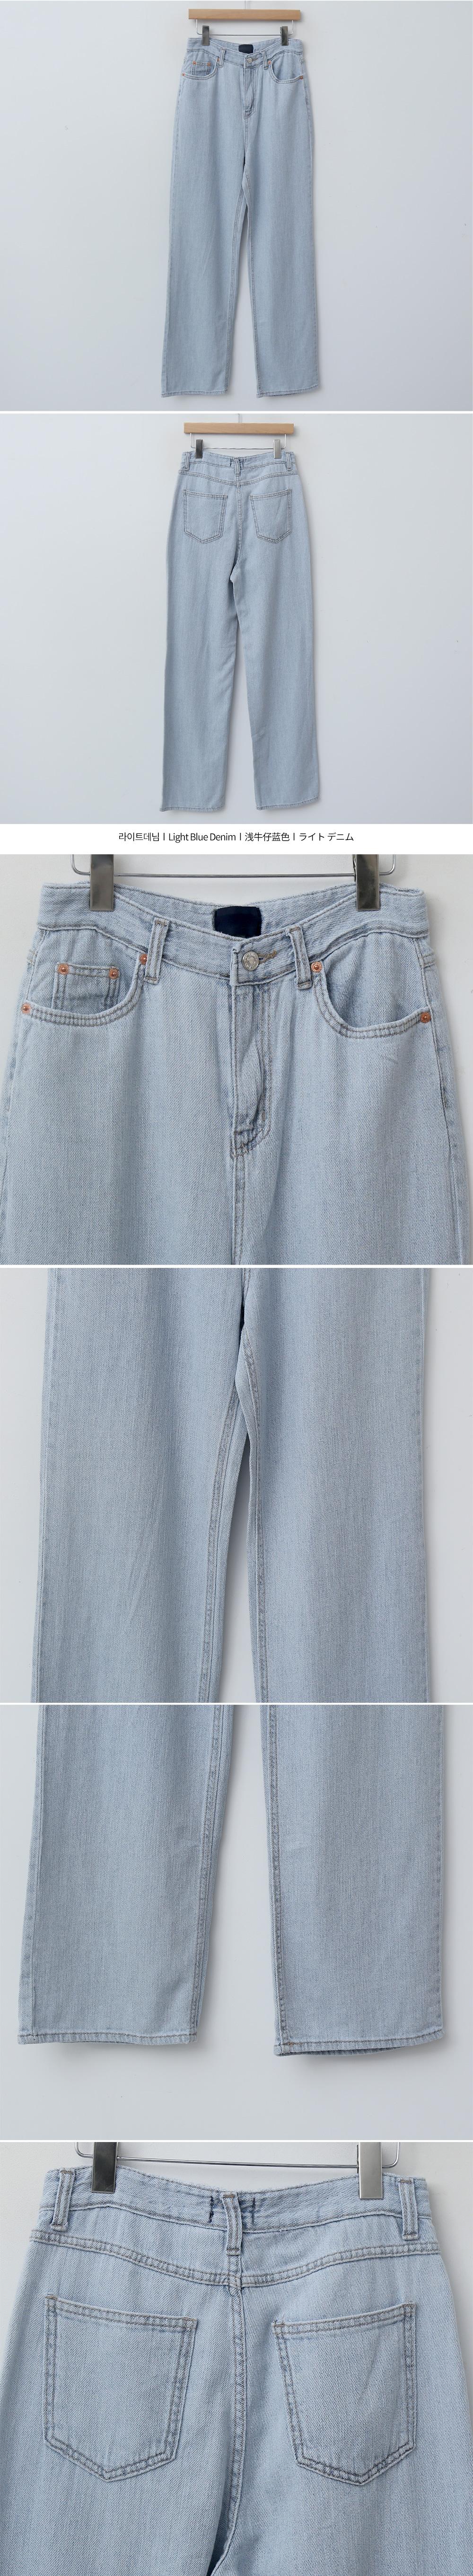 Light Faded Denim Pants